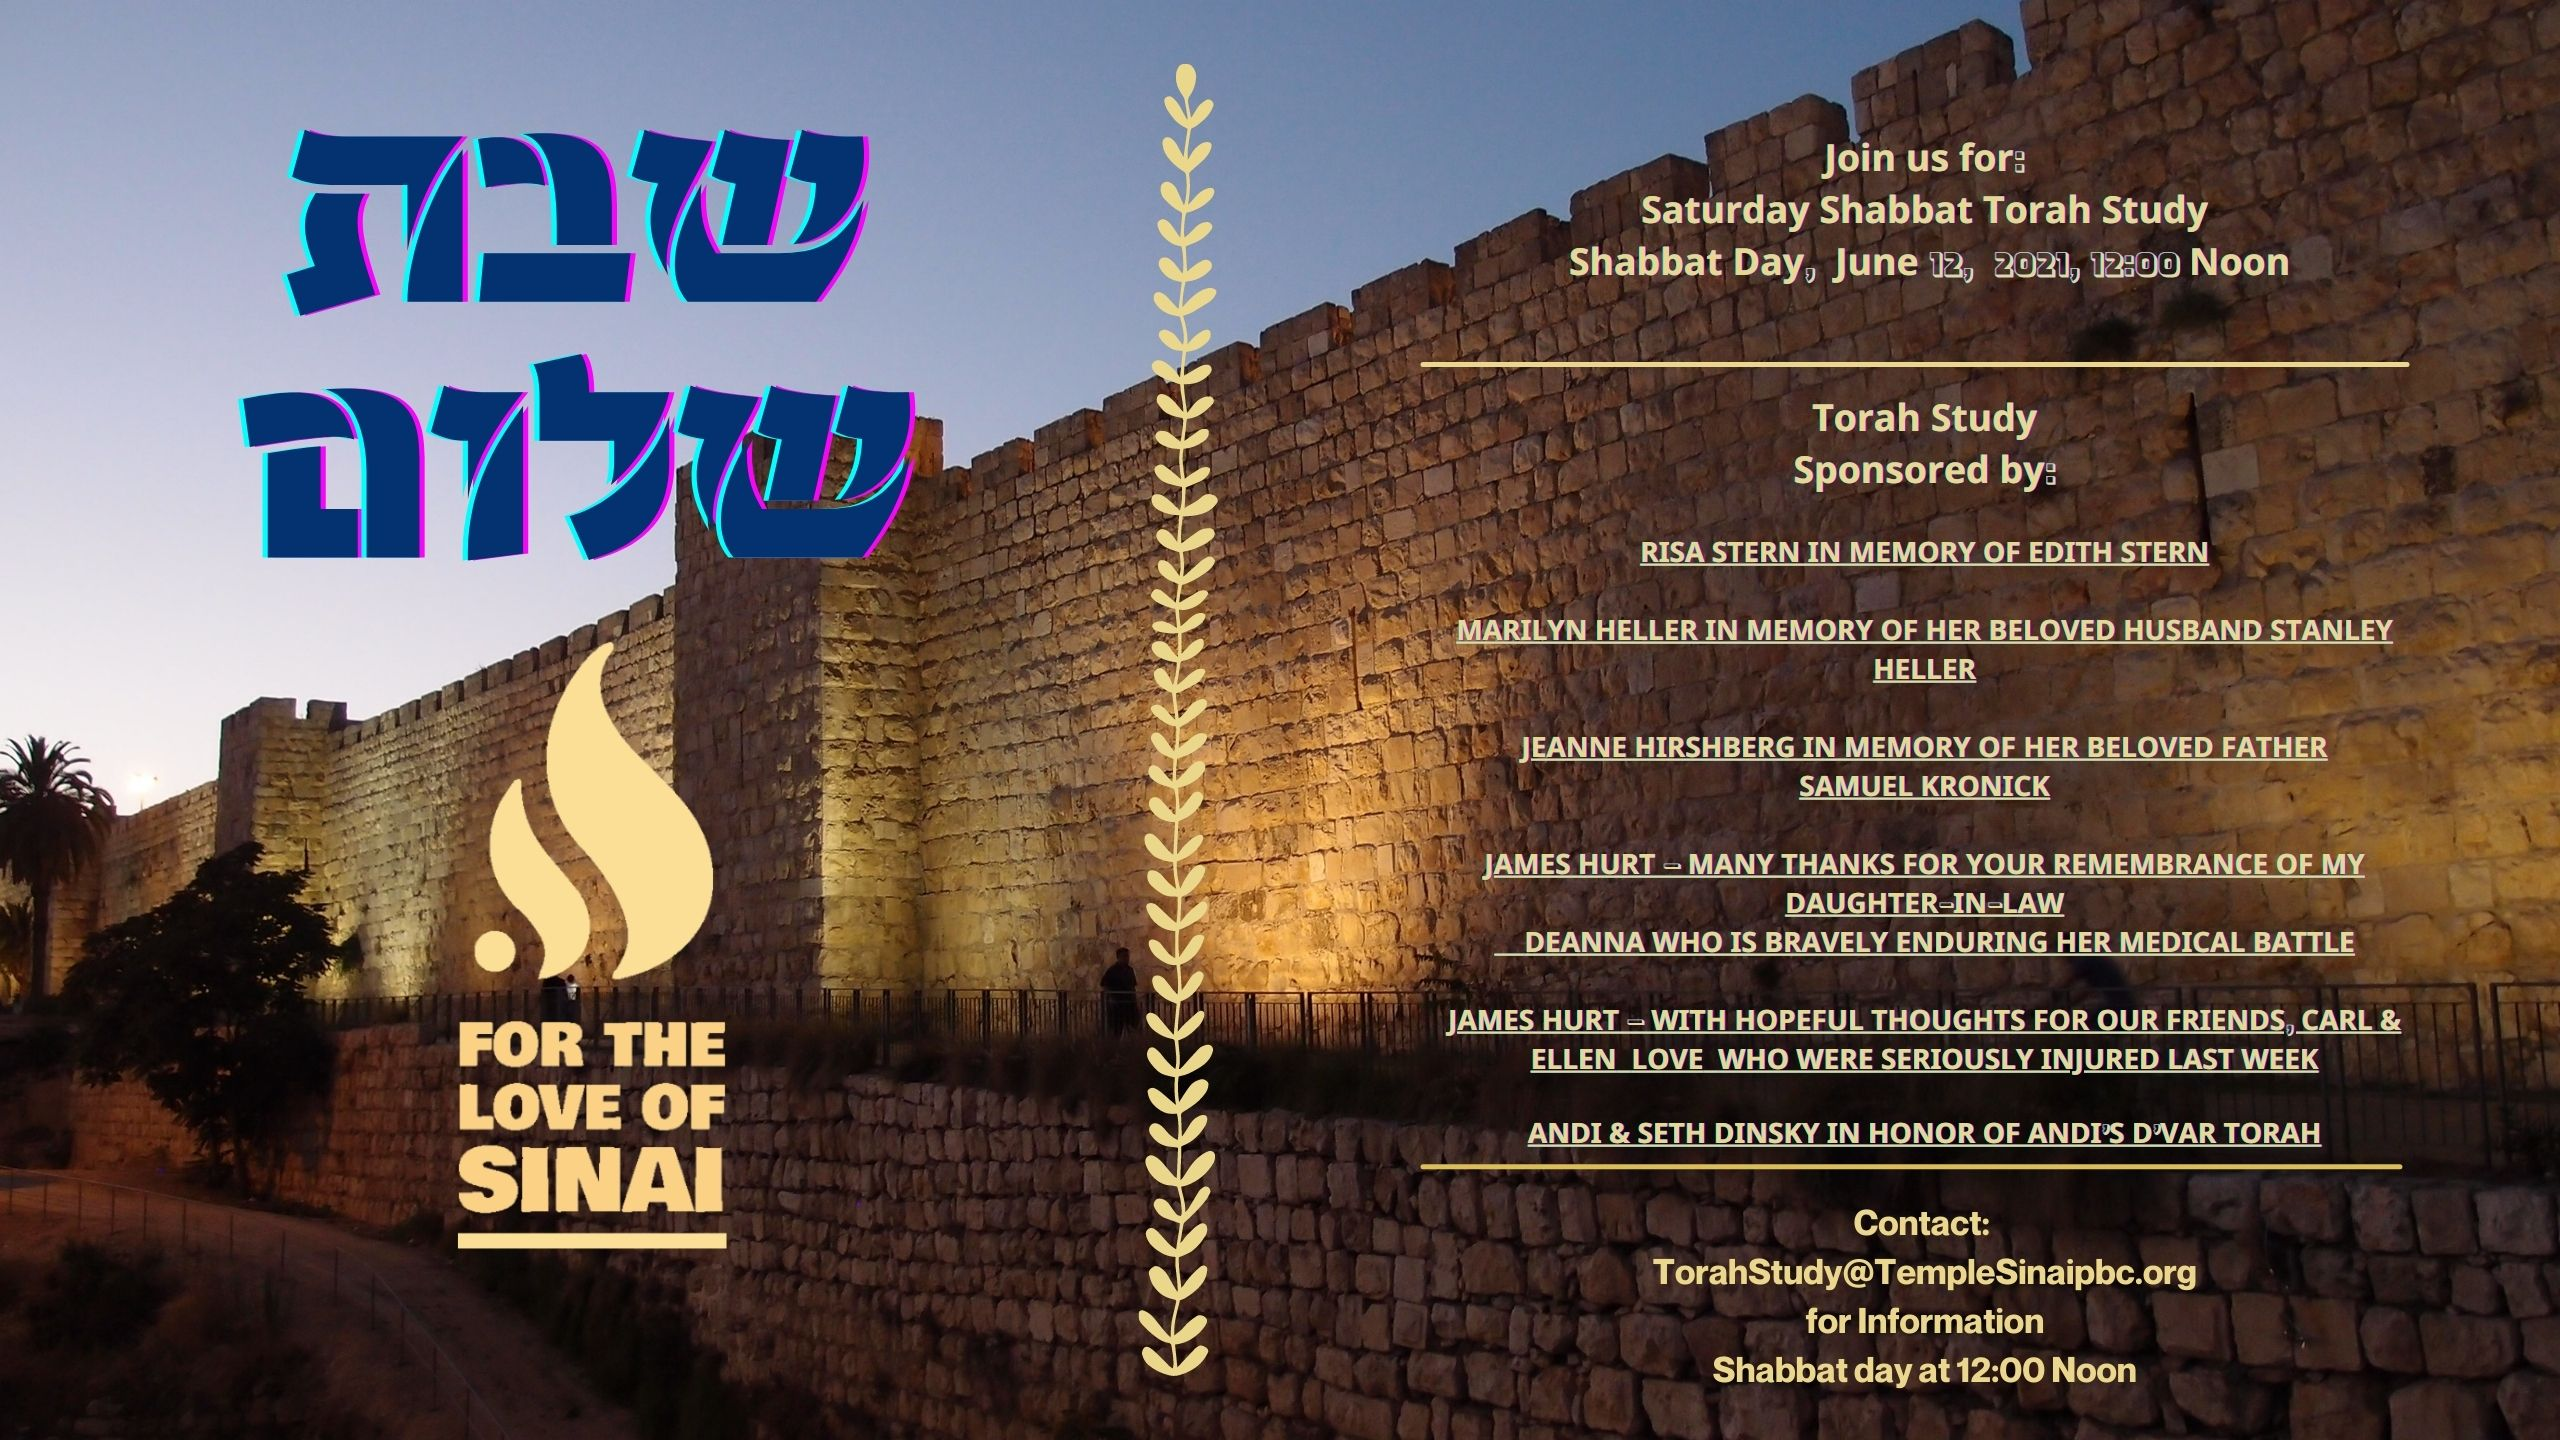 TorahStudy@TempleSinaiPBC.org   TORAH PORTION Korach Numbers 16:1−18:32| 2 Tammuz 5781 Haftarah: I Samuel 11:14-12:22 Numbers 16:1-2